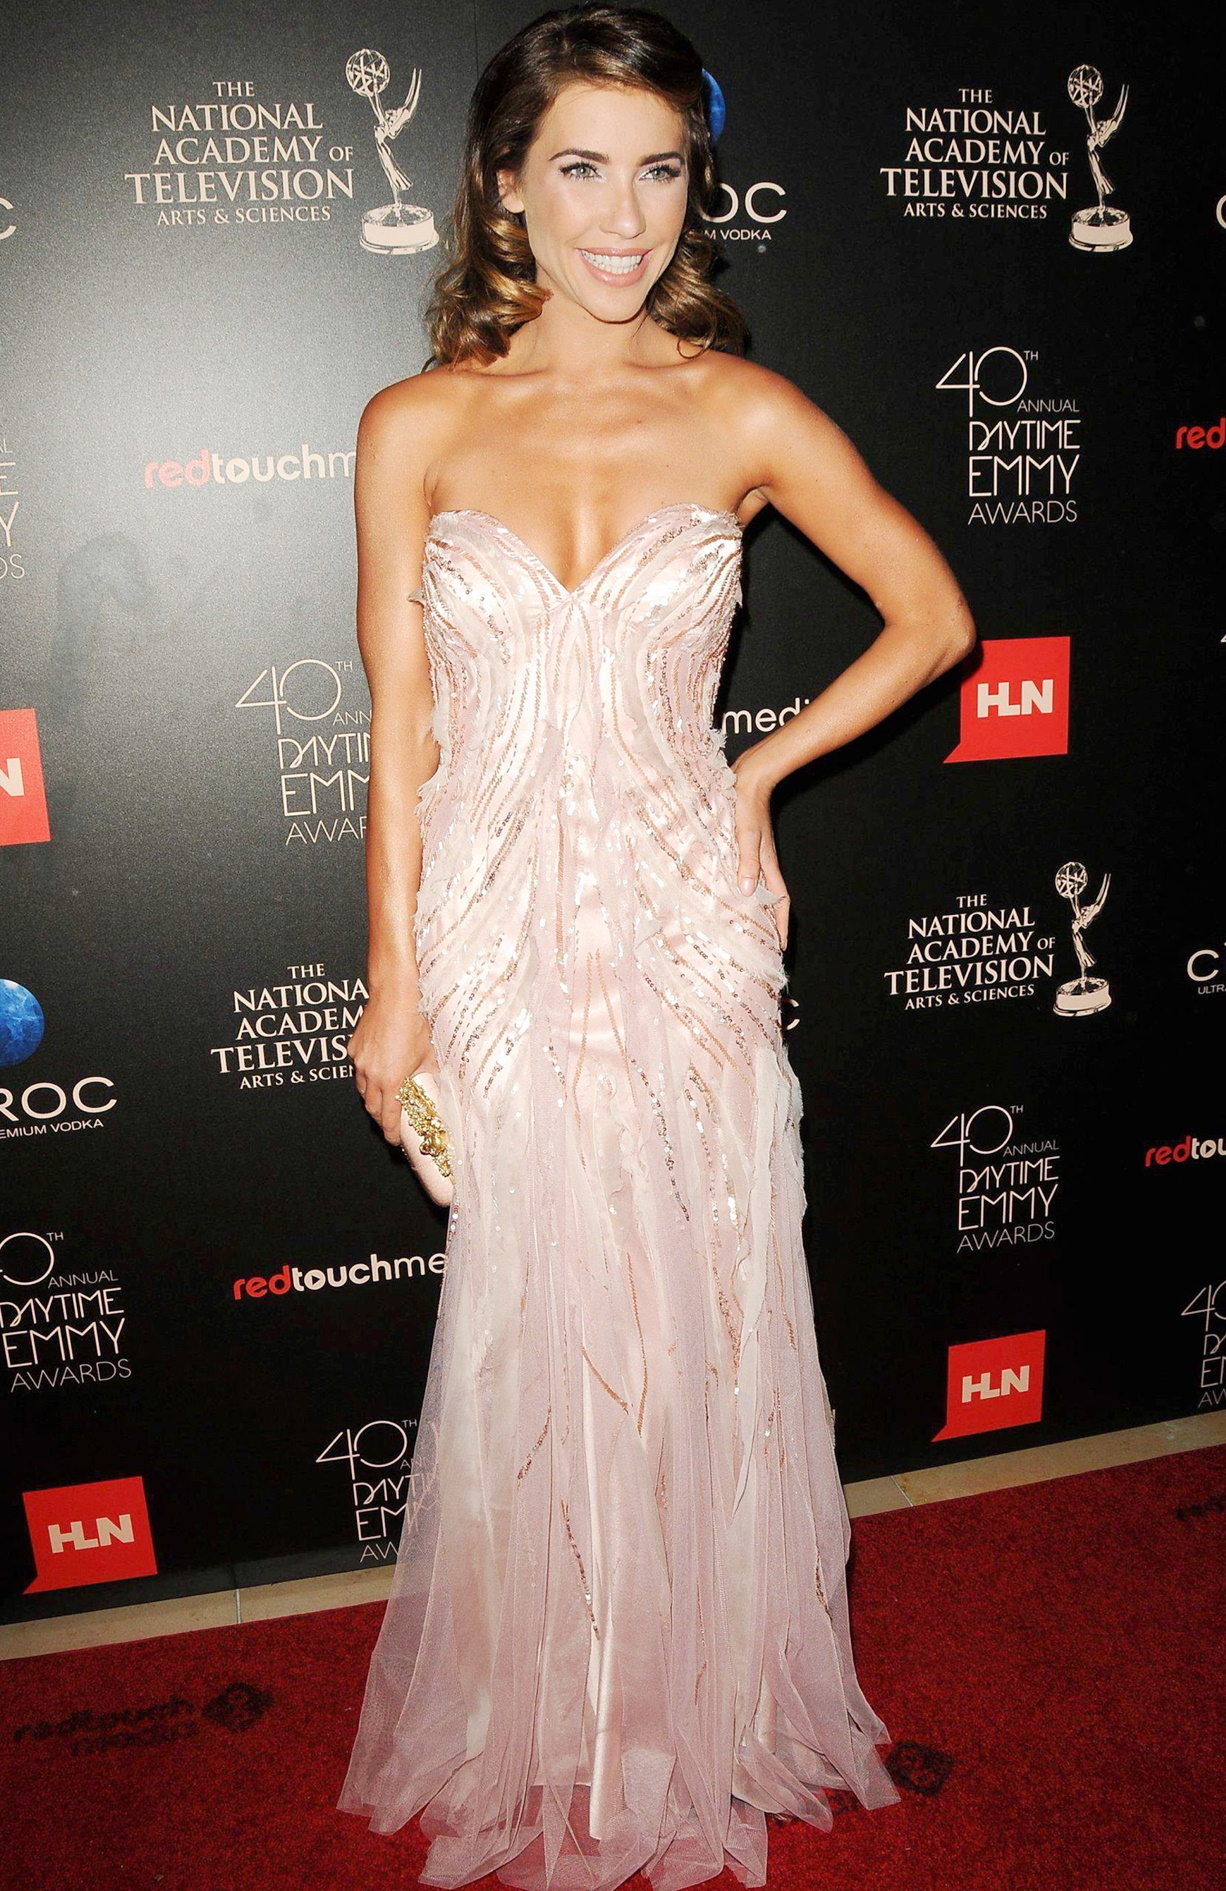 Jacqueline MacInnes Wood Daytime Emmys 2014 B&B